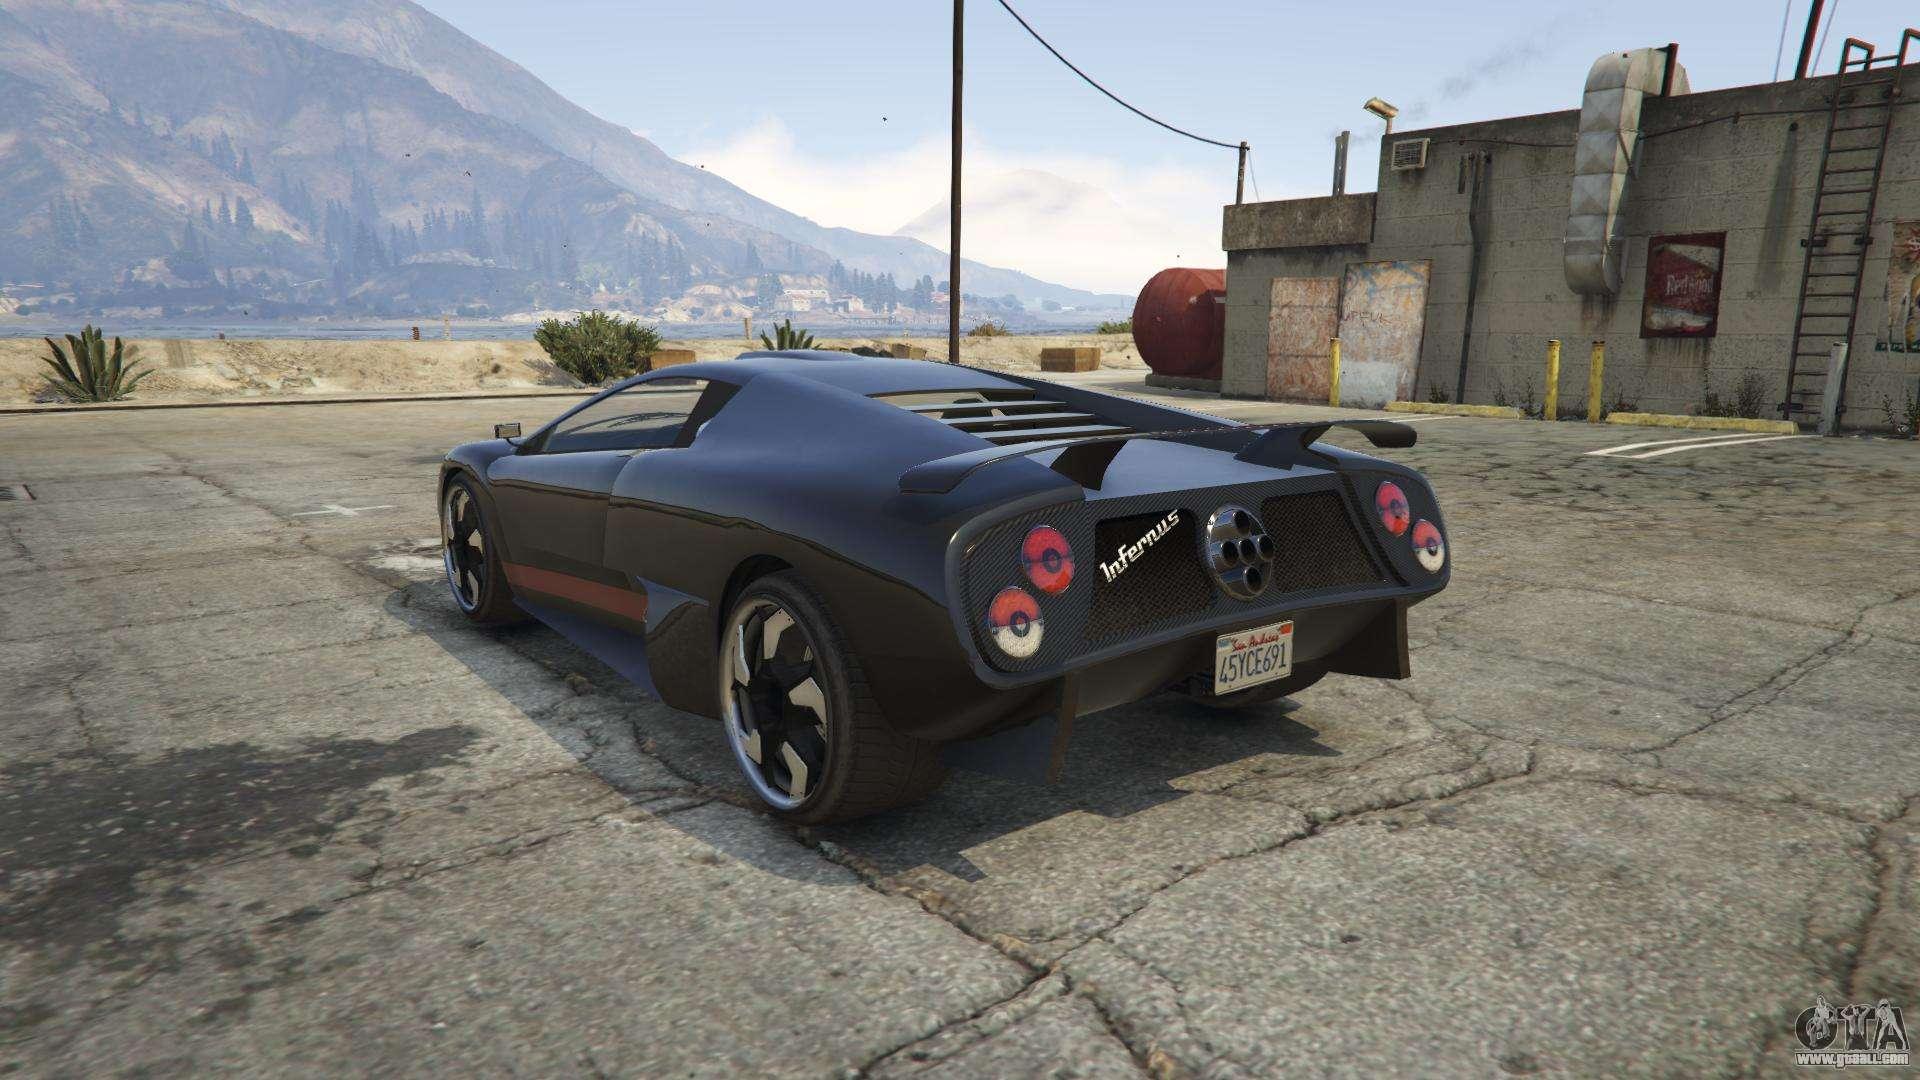 Pegassi Infernus from GTA 5 - screenshots, features and description  supercar.